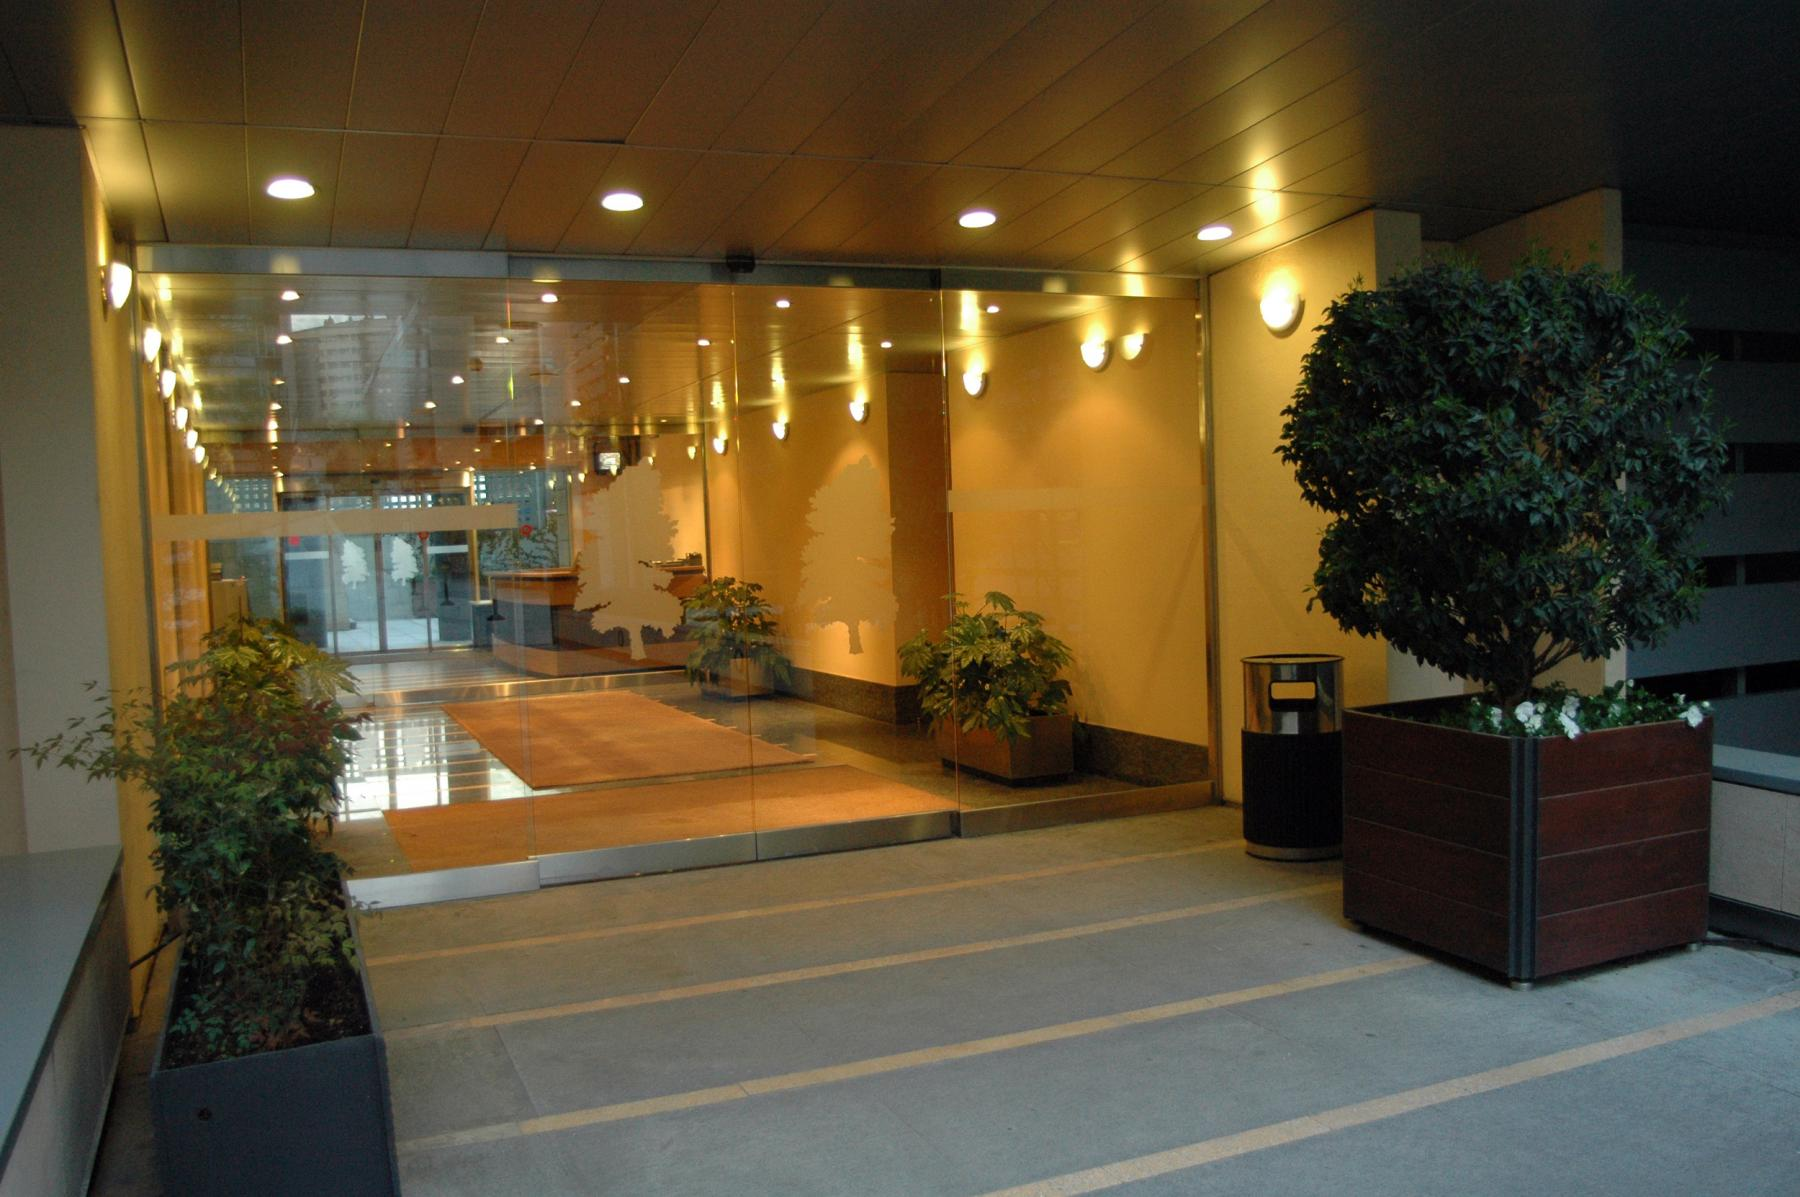 Alquilar oficinas Calle de Serrano Galvache 33, Madrid (5)